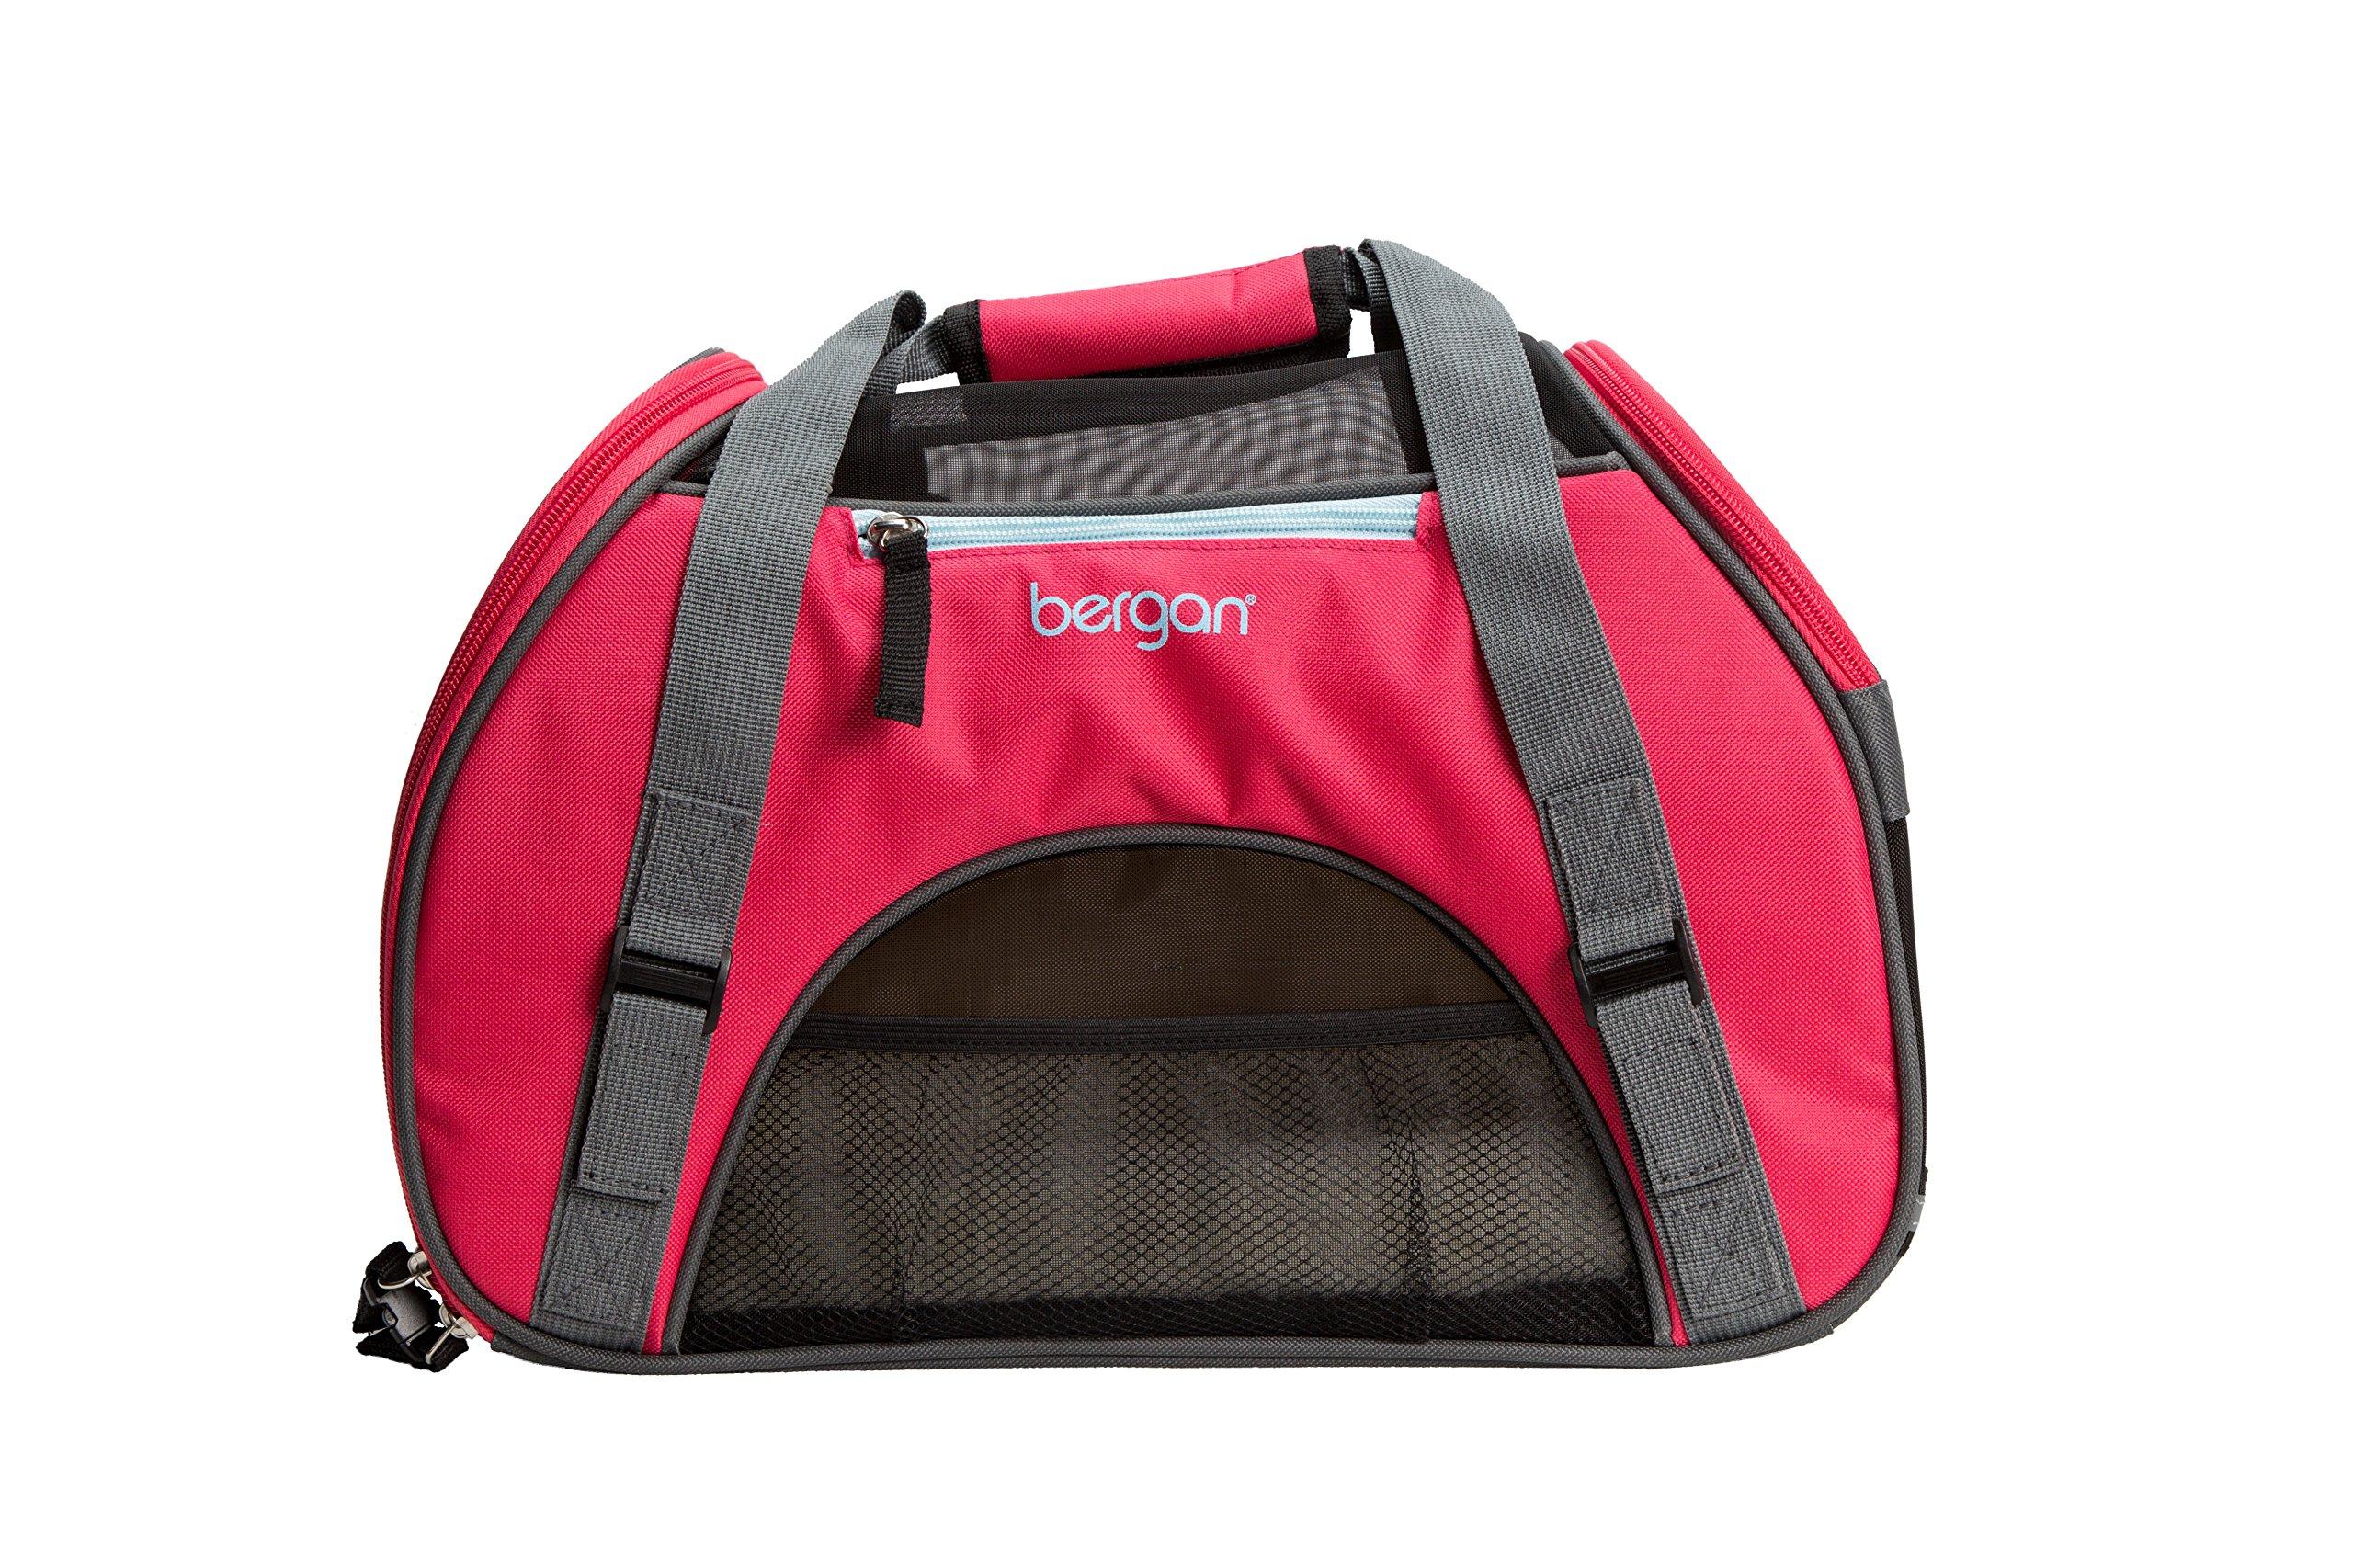 Bergan Comfort Carrier, Small, Berry Pink